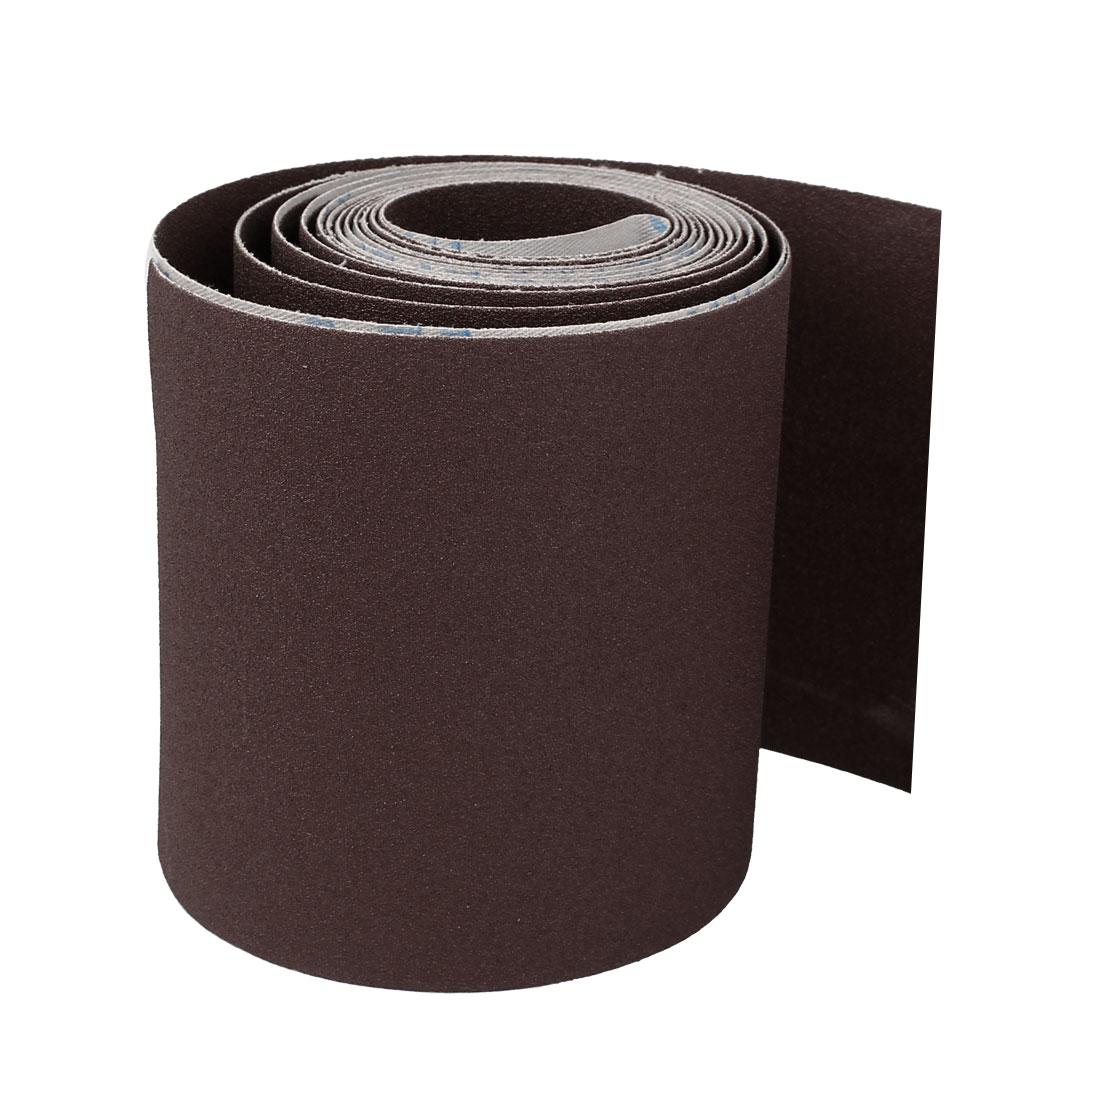 5M Long 115mm Width 100 Grit Abrasive Sanding Sand Paper Sandpaper